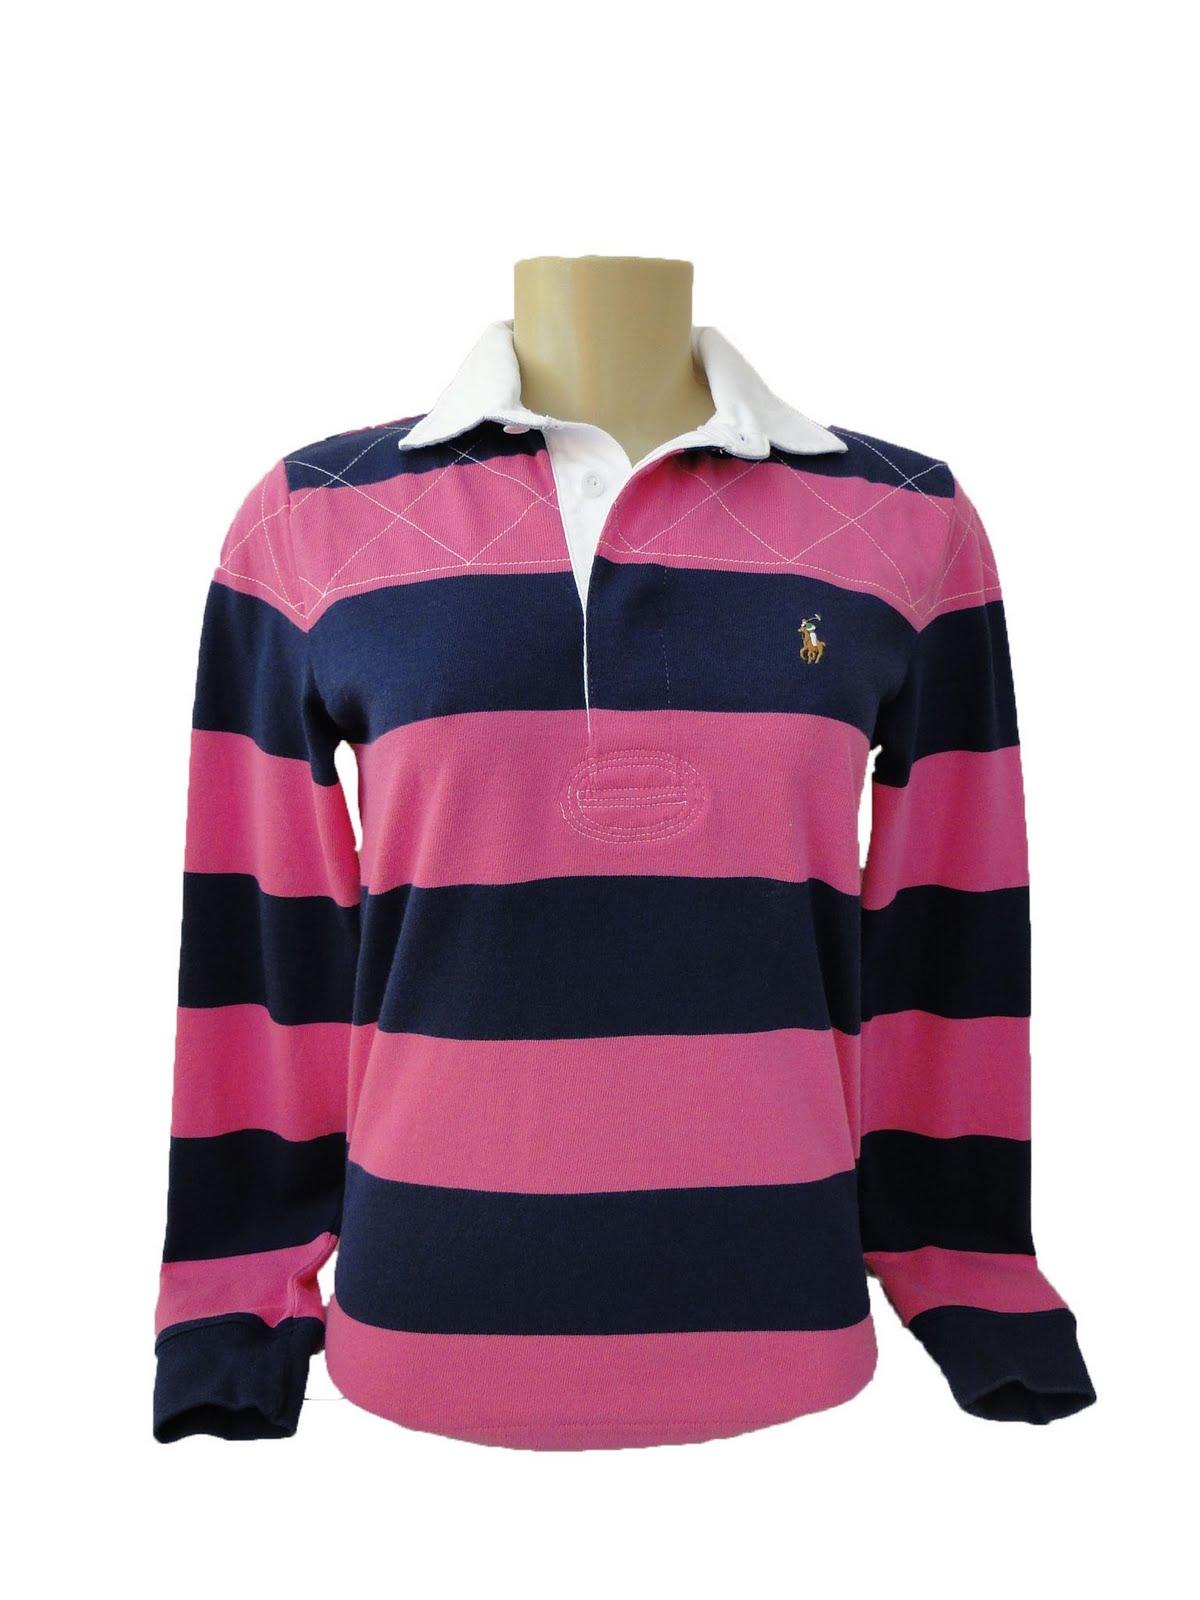 Blusa polo feminina Polo Ralph Lauren. Cor  Rosa com listras ... 2887db5ecceb1